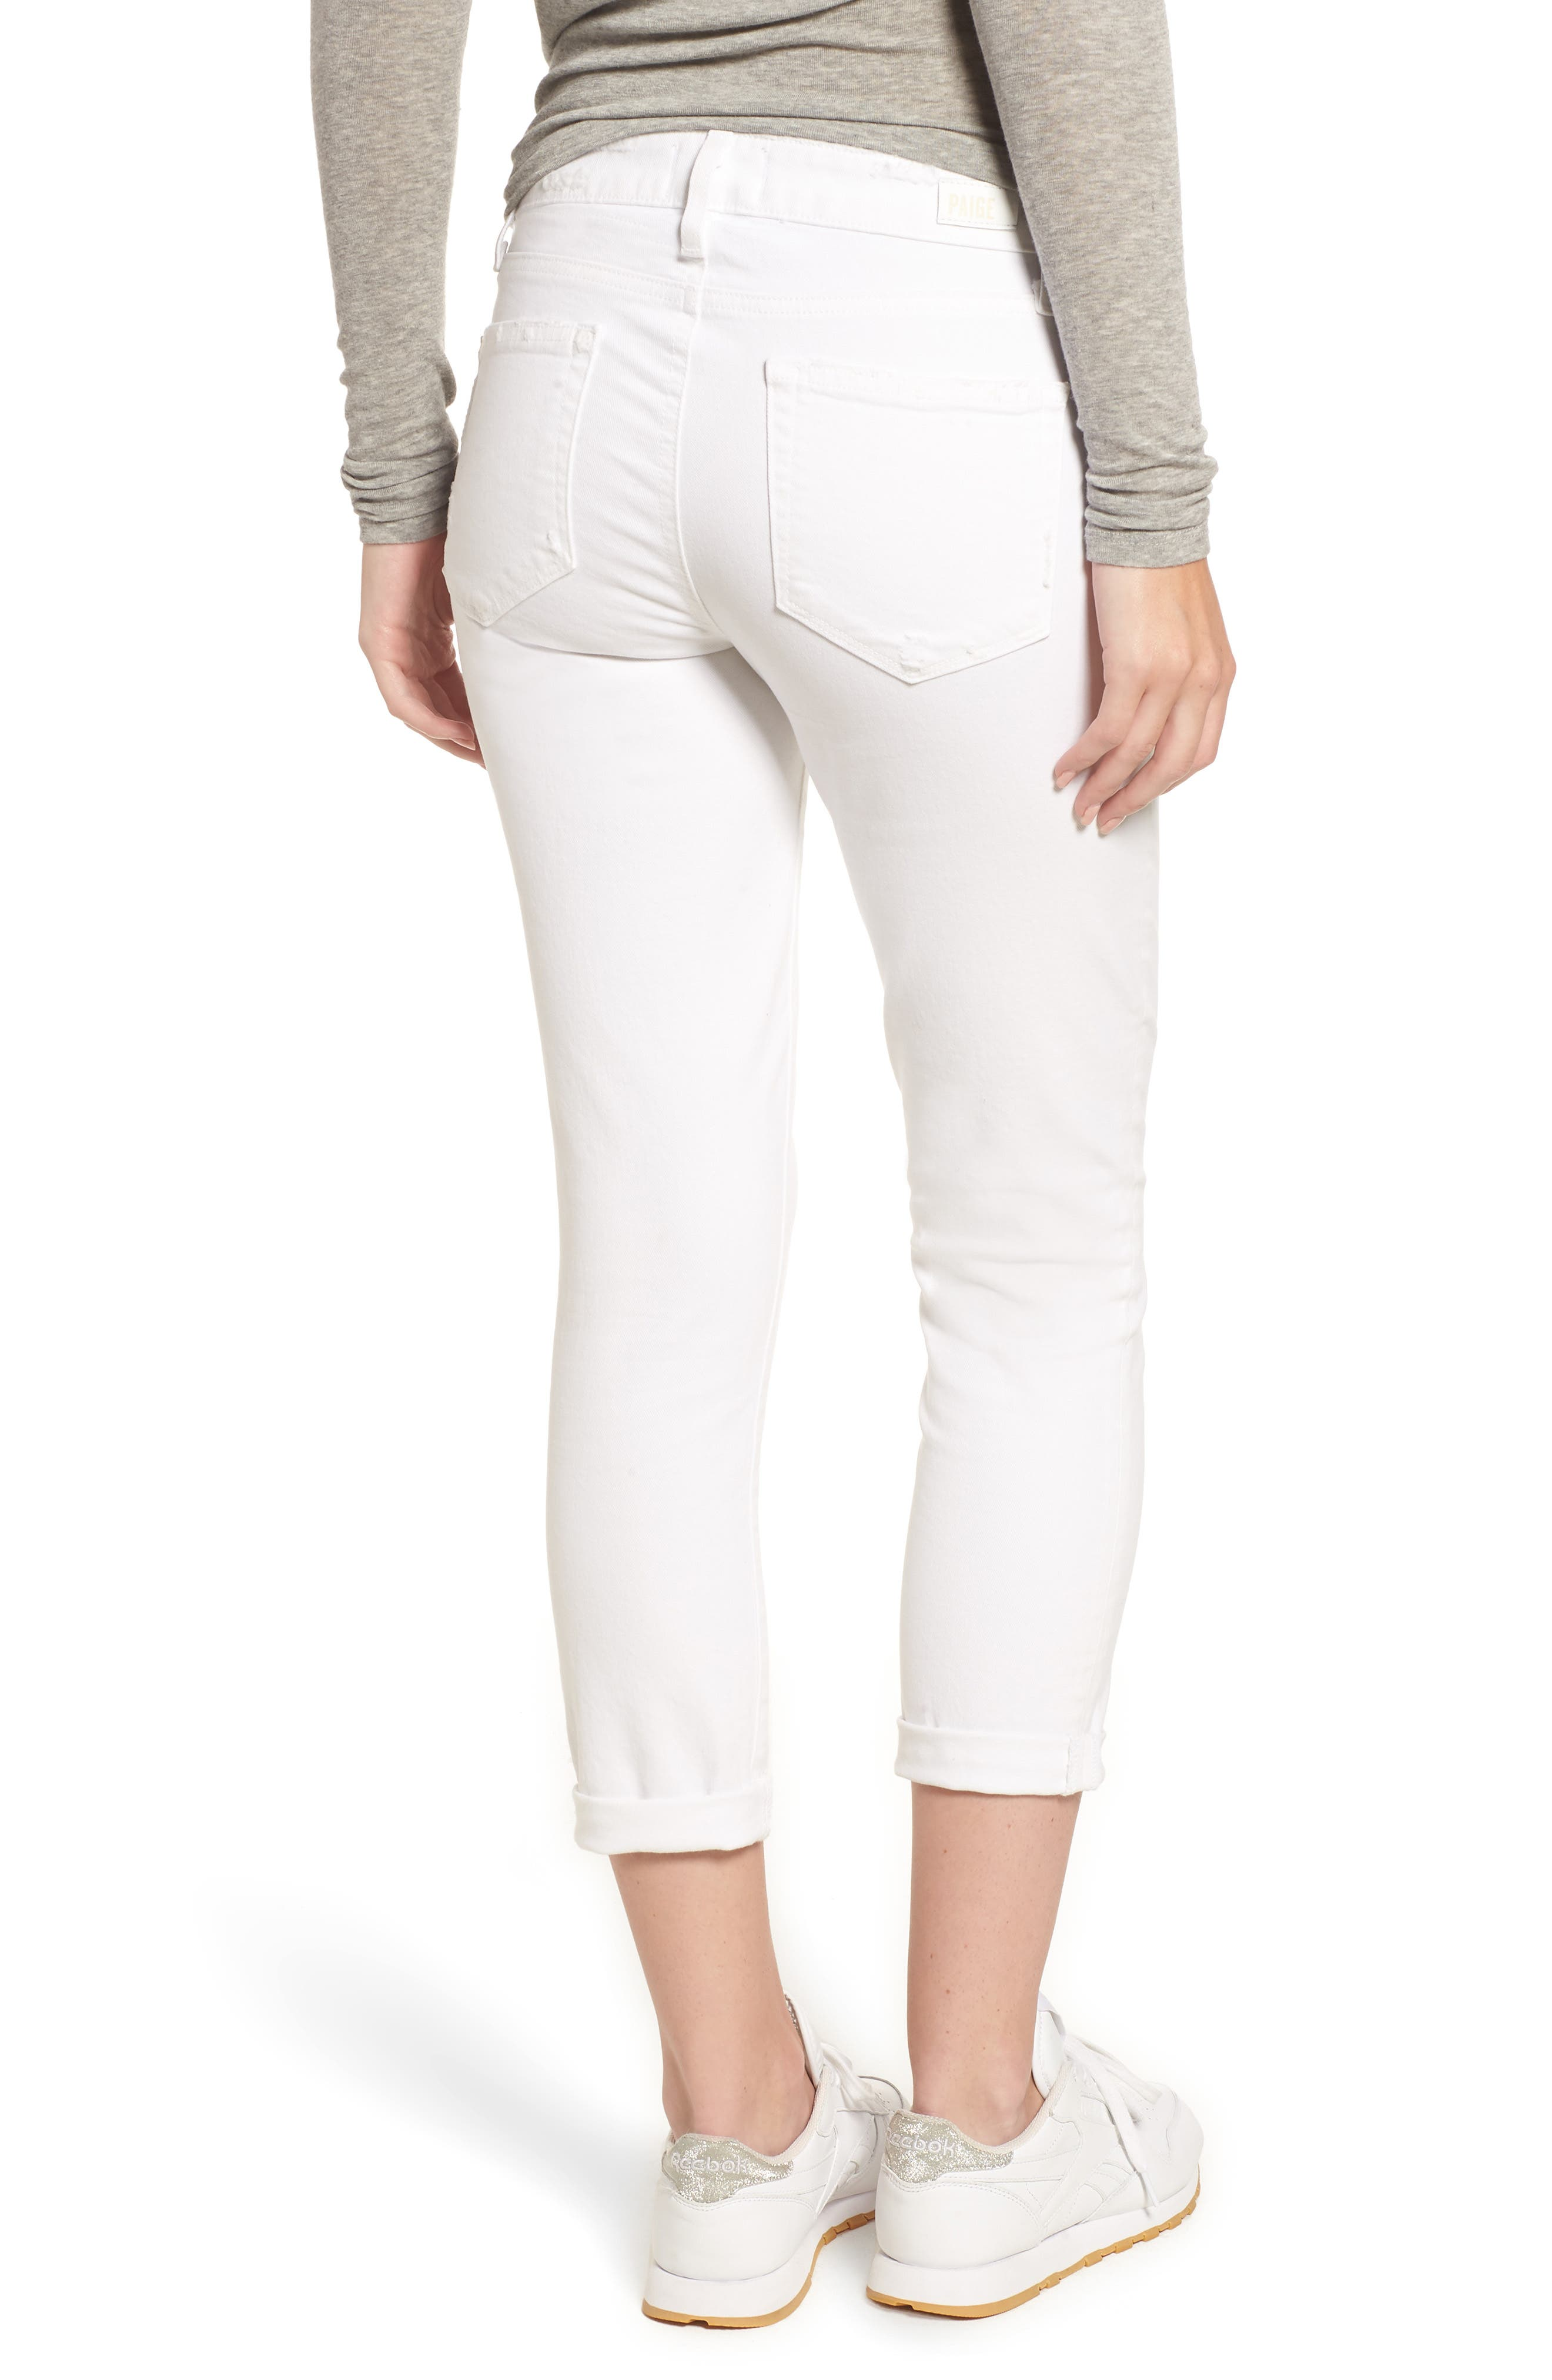 Skyline Raw Hem Crop Skinny Jeans,                             Alternate thumbnail 2, color,                             LIVED IN CRISP WHITE